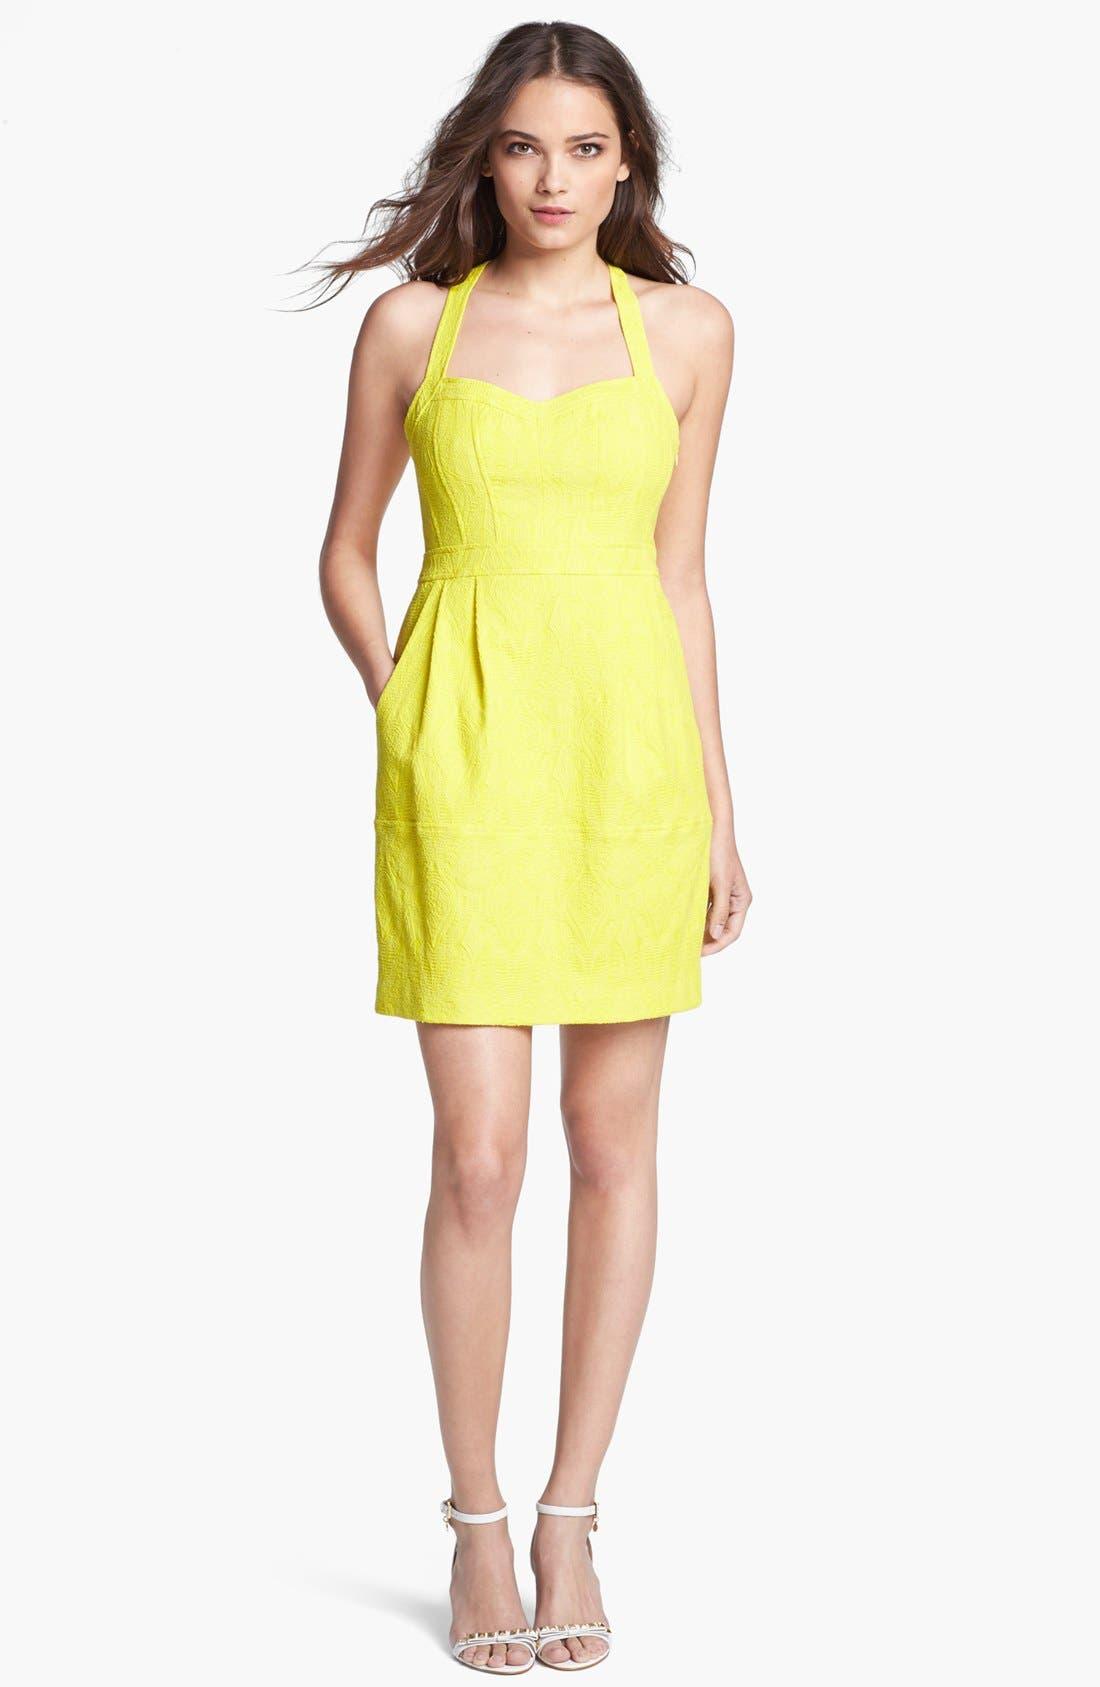 Main Image - Nanette Lepore 'Honeymoon' Cotton Blend A-Line Dress